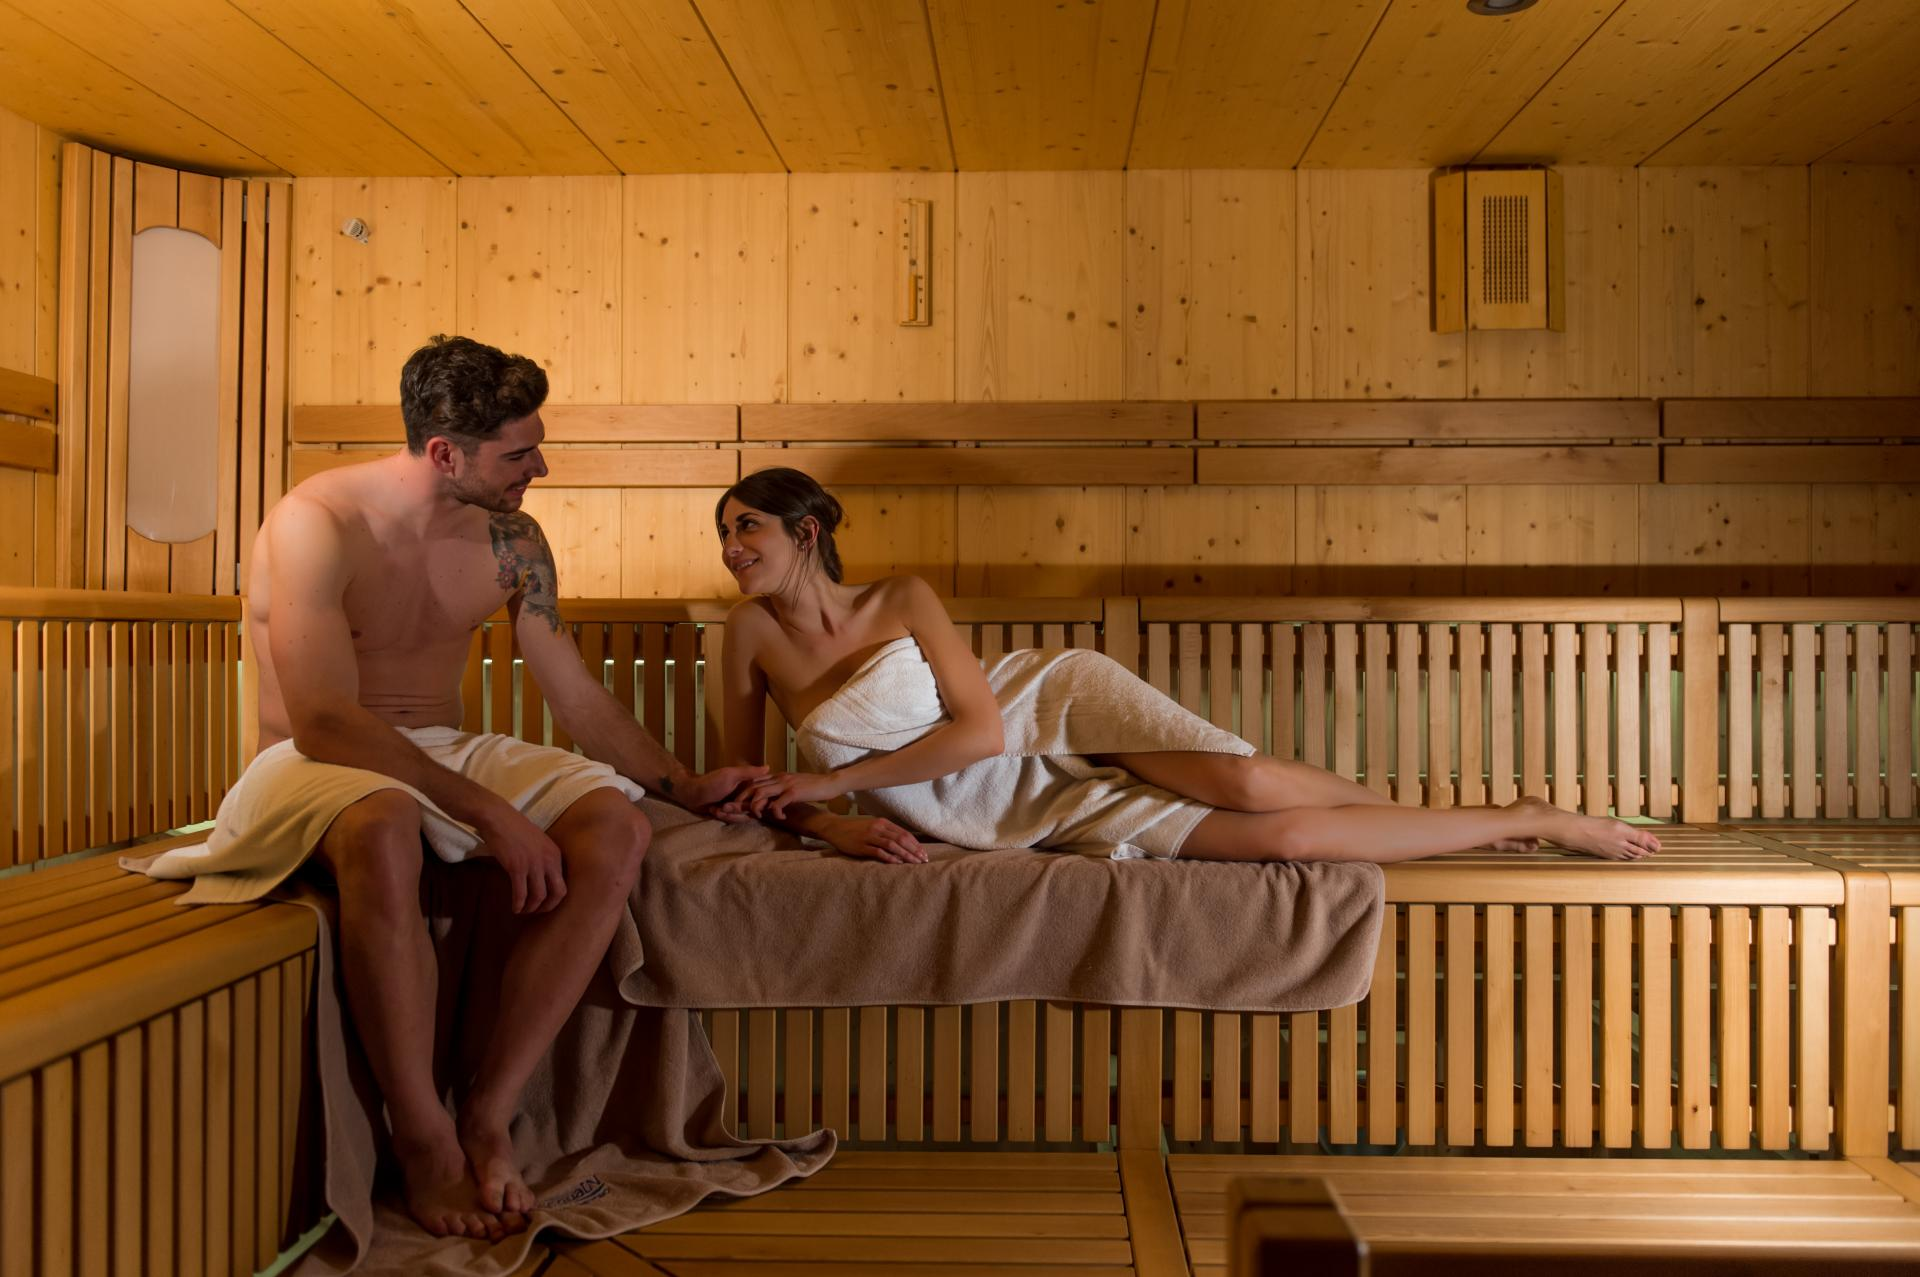 2016_PHMatteoDeStefano_Andalo_LifePark_Acquain_Trentino_Alto_Adige_Paganella_Dolomiti_Spa_Wellness_Benessere_Saune_Sauna_aufguss_433.jpg